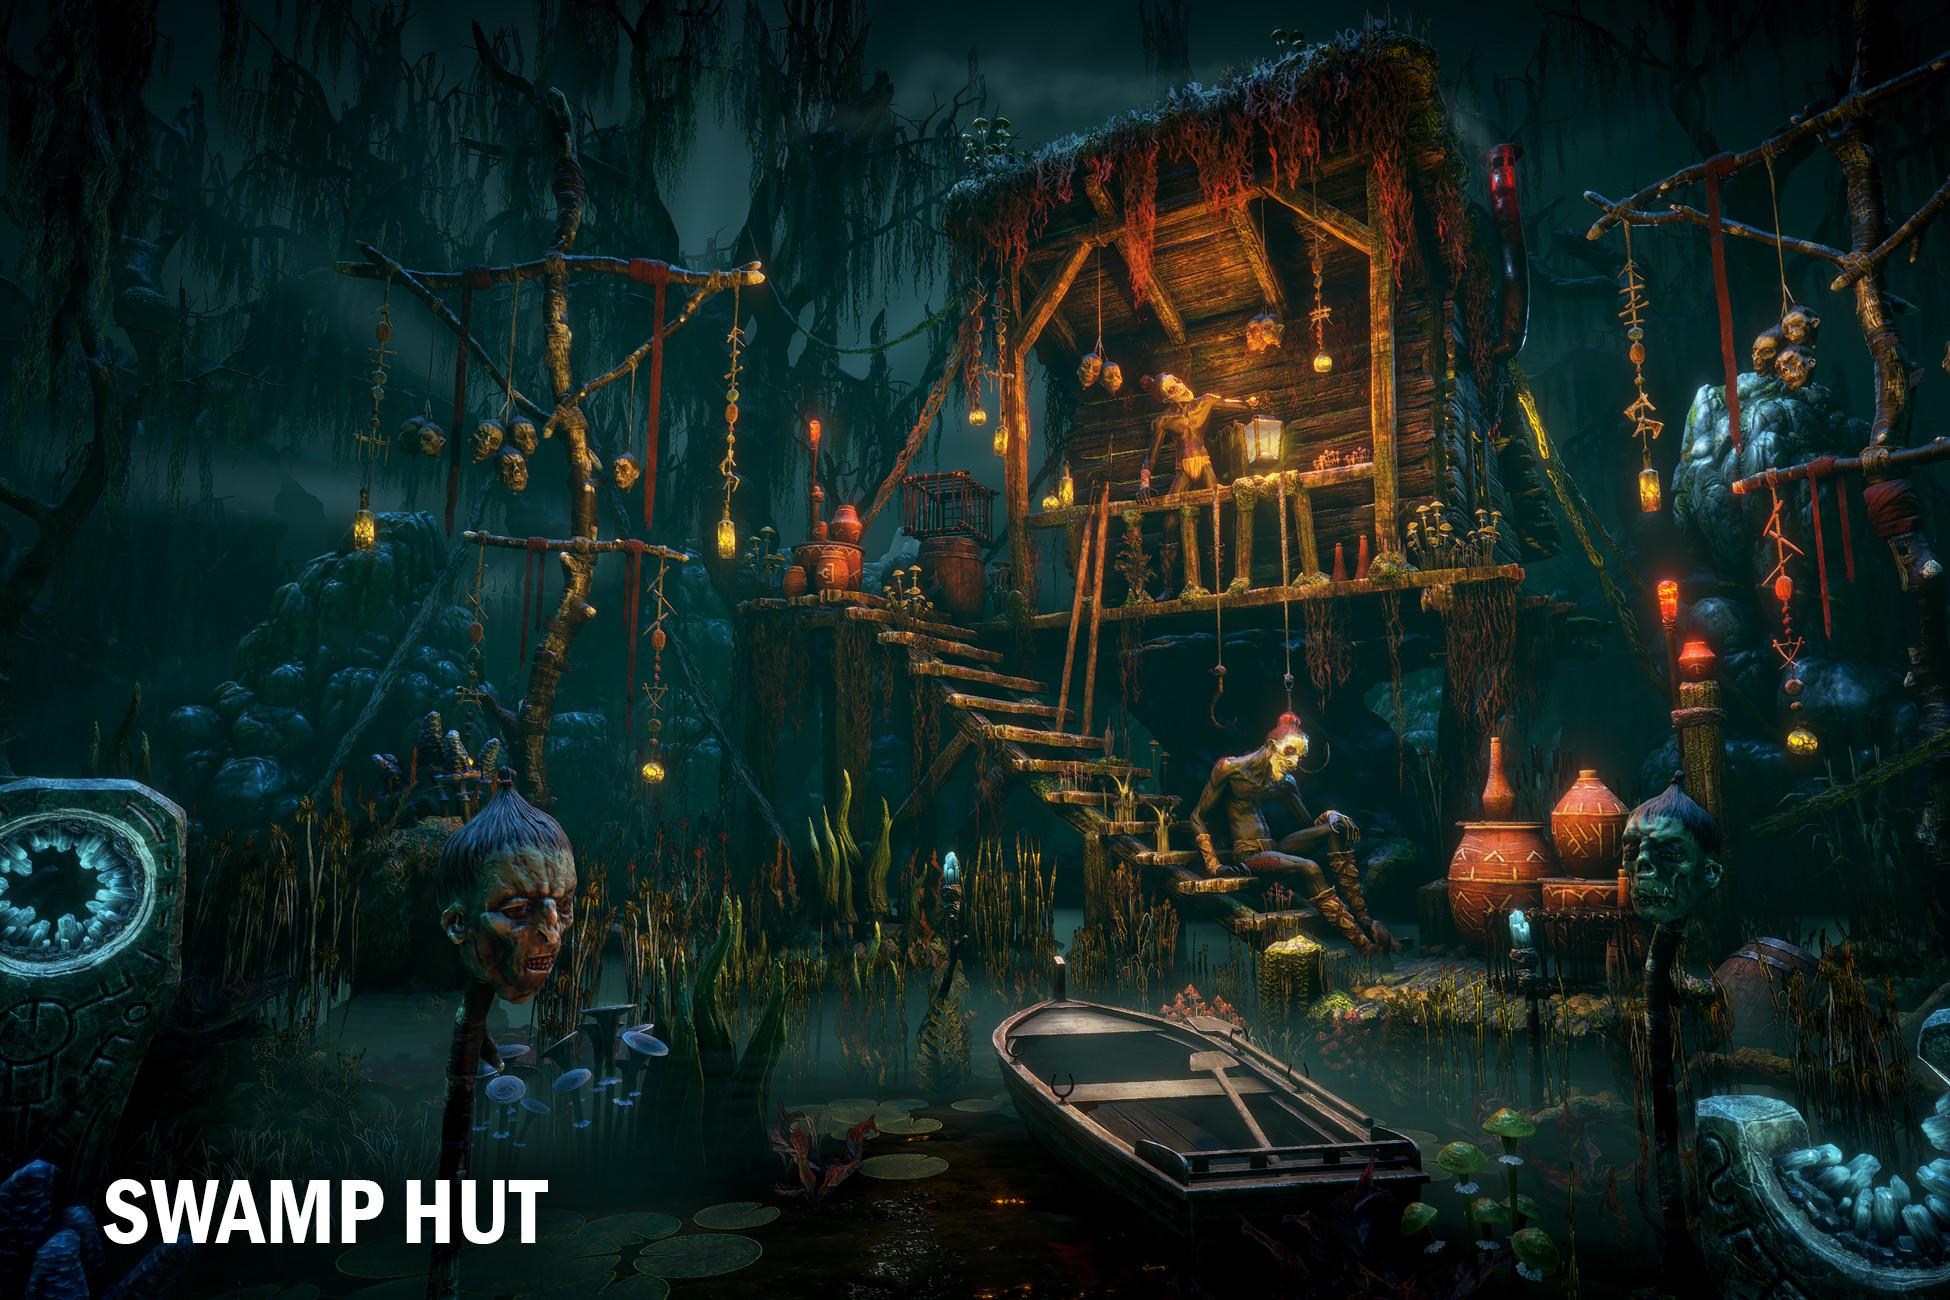 Swamp hut